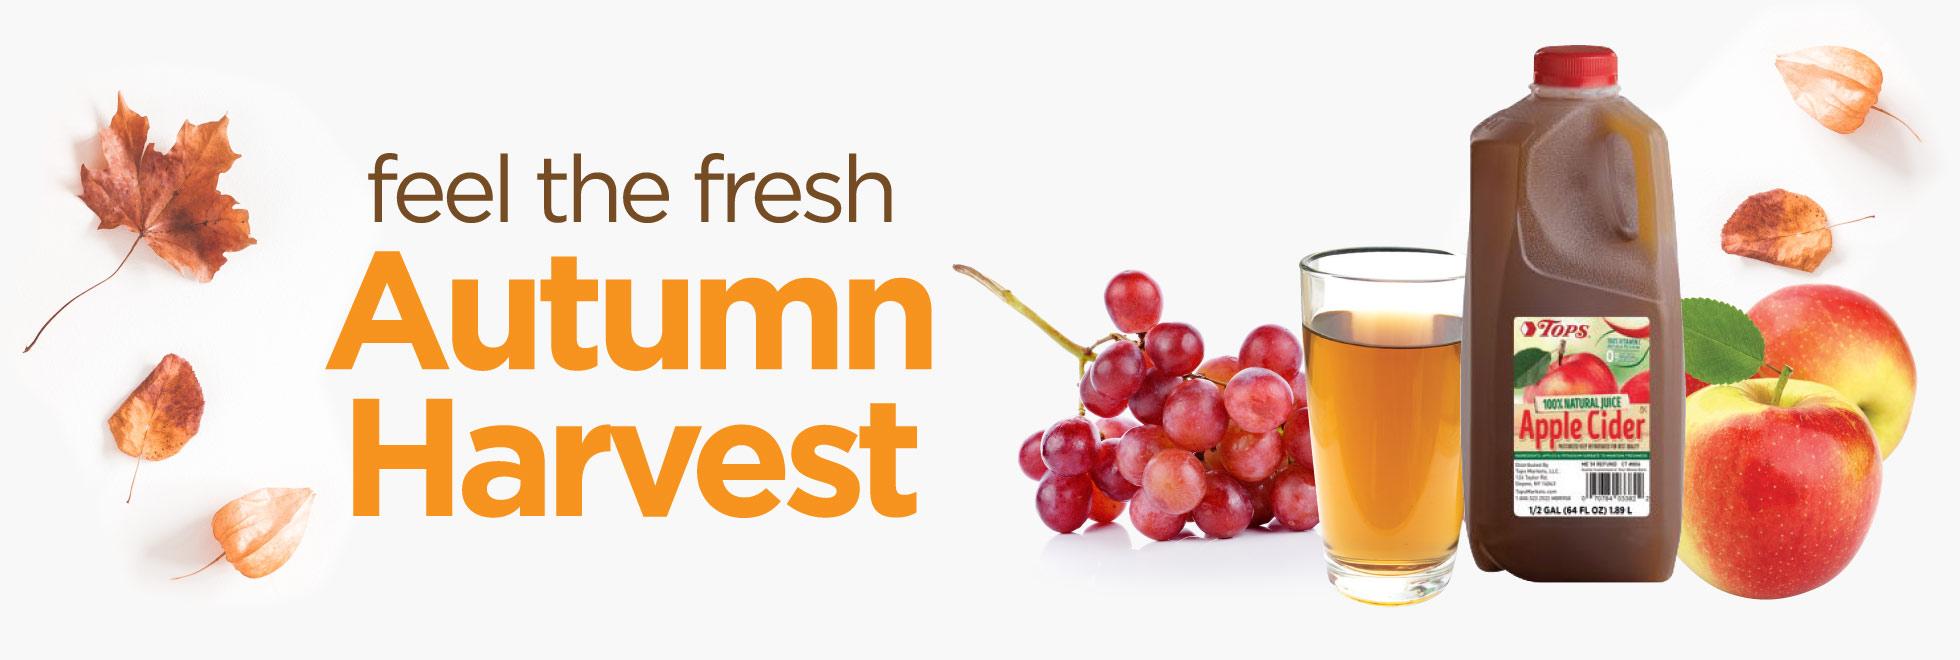 First Autumn Savings